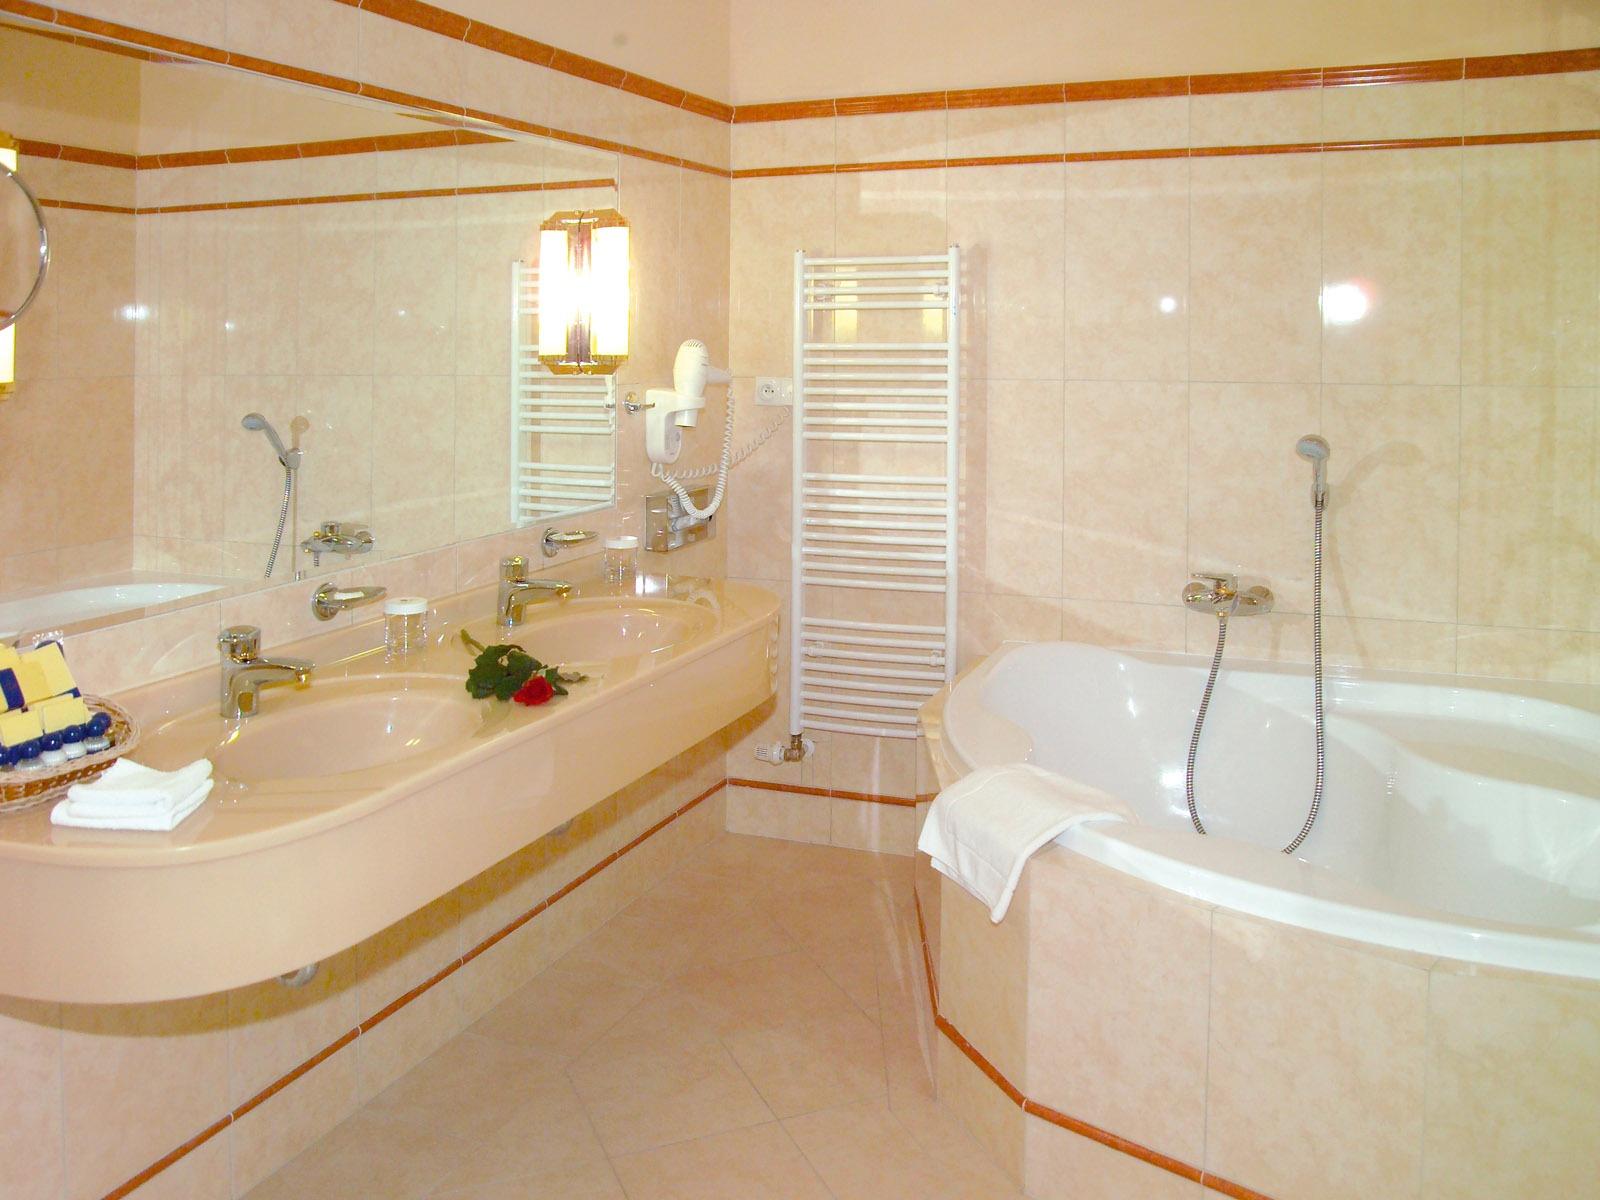 Fond d 39 cran photo salle de bain 1 20 1600x1200 fond for Ecran salle de bain